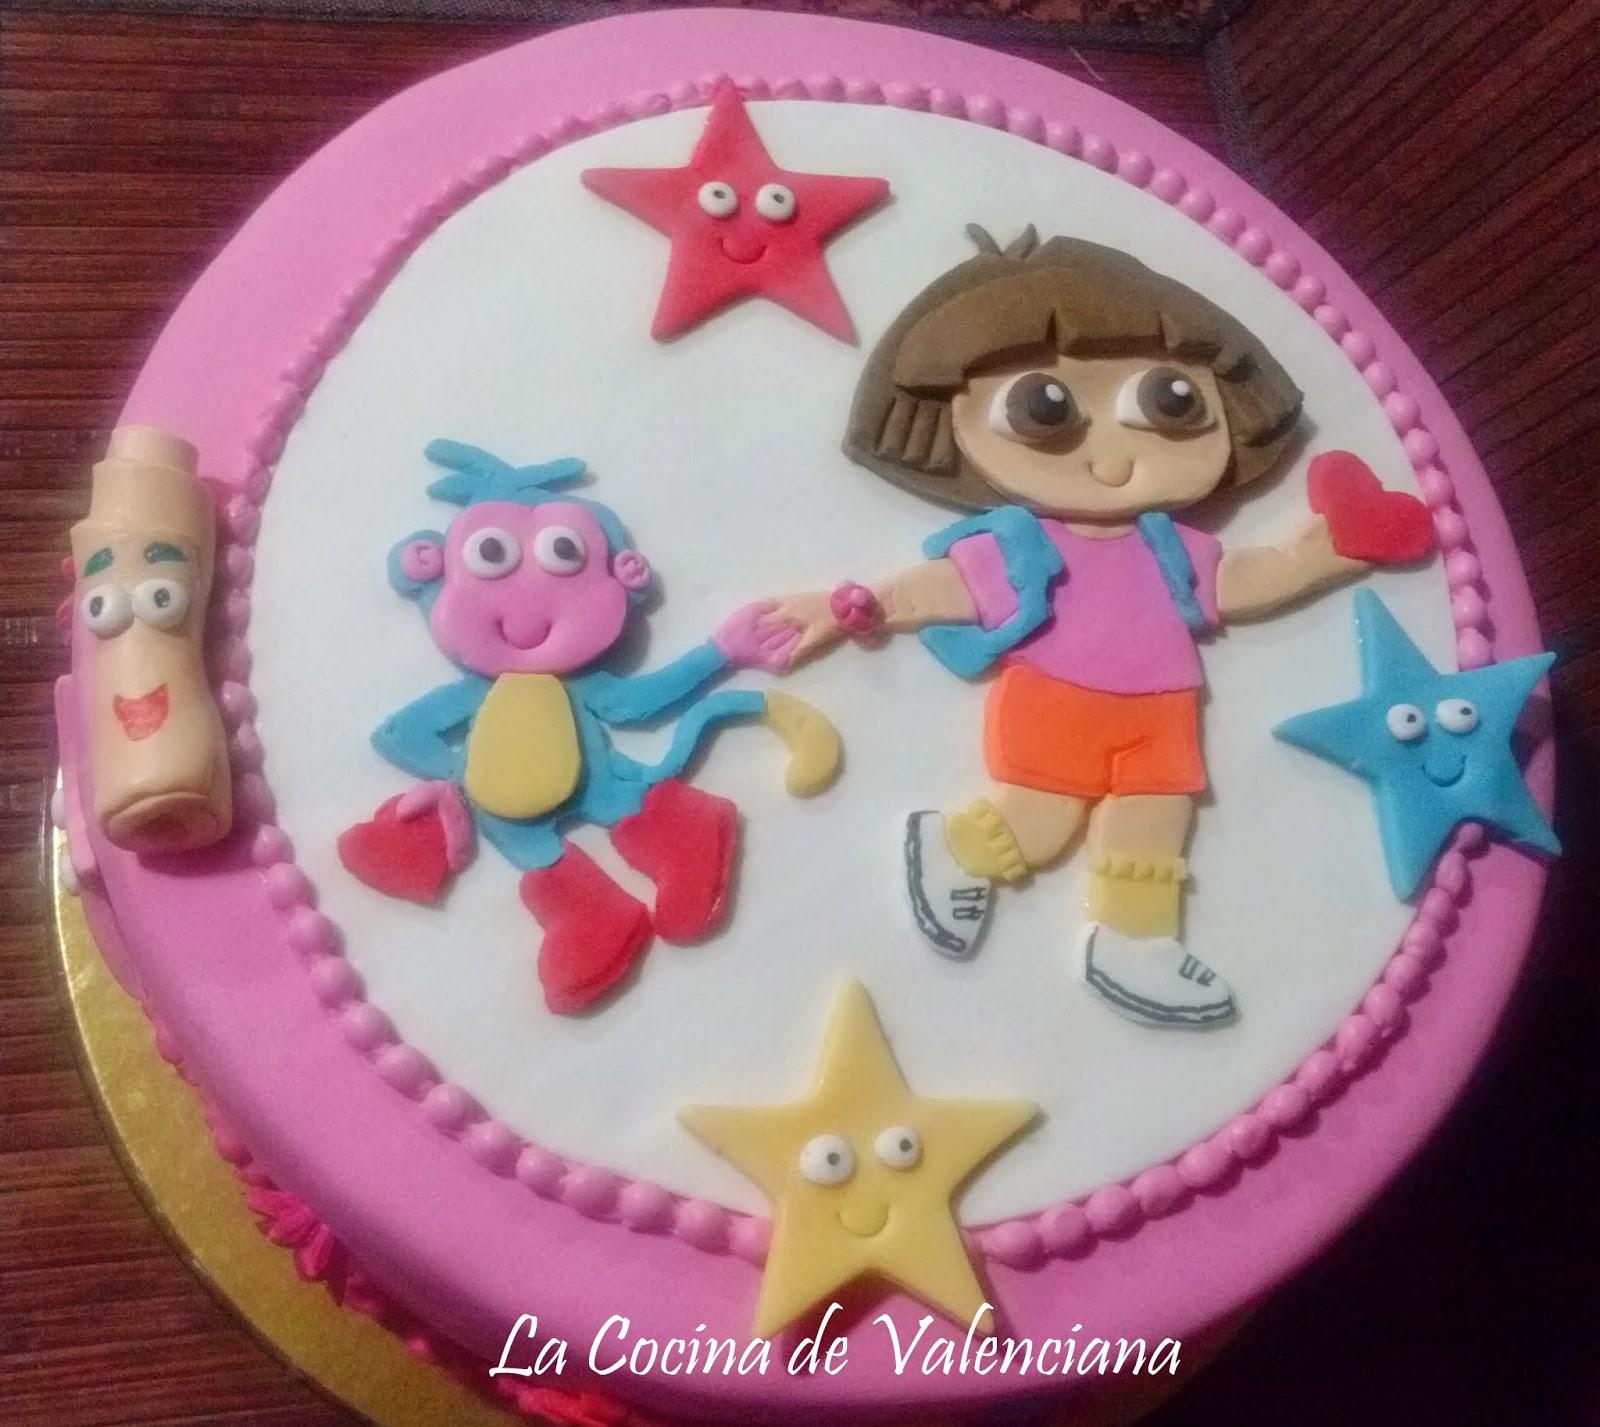 La cocina de valenciana mi segunda tarta fondat dora la exploradora - Dora la exploradora cocina ...